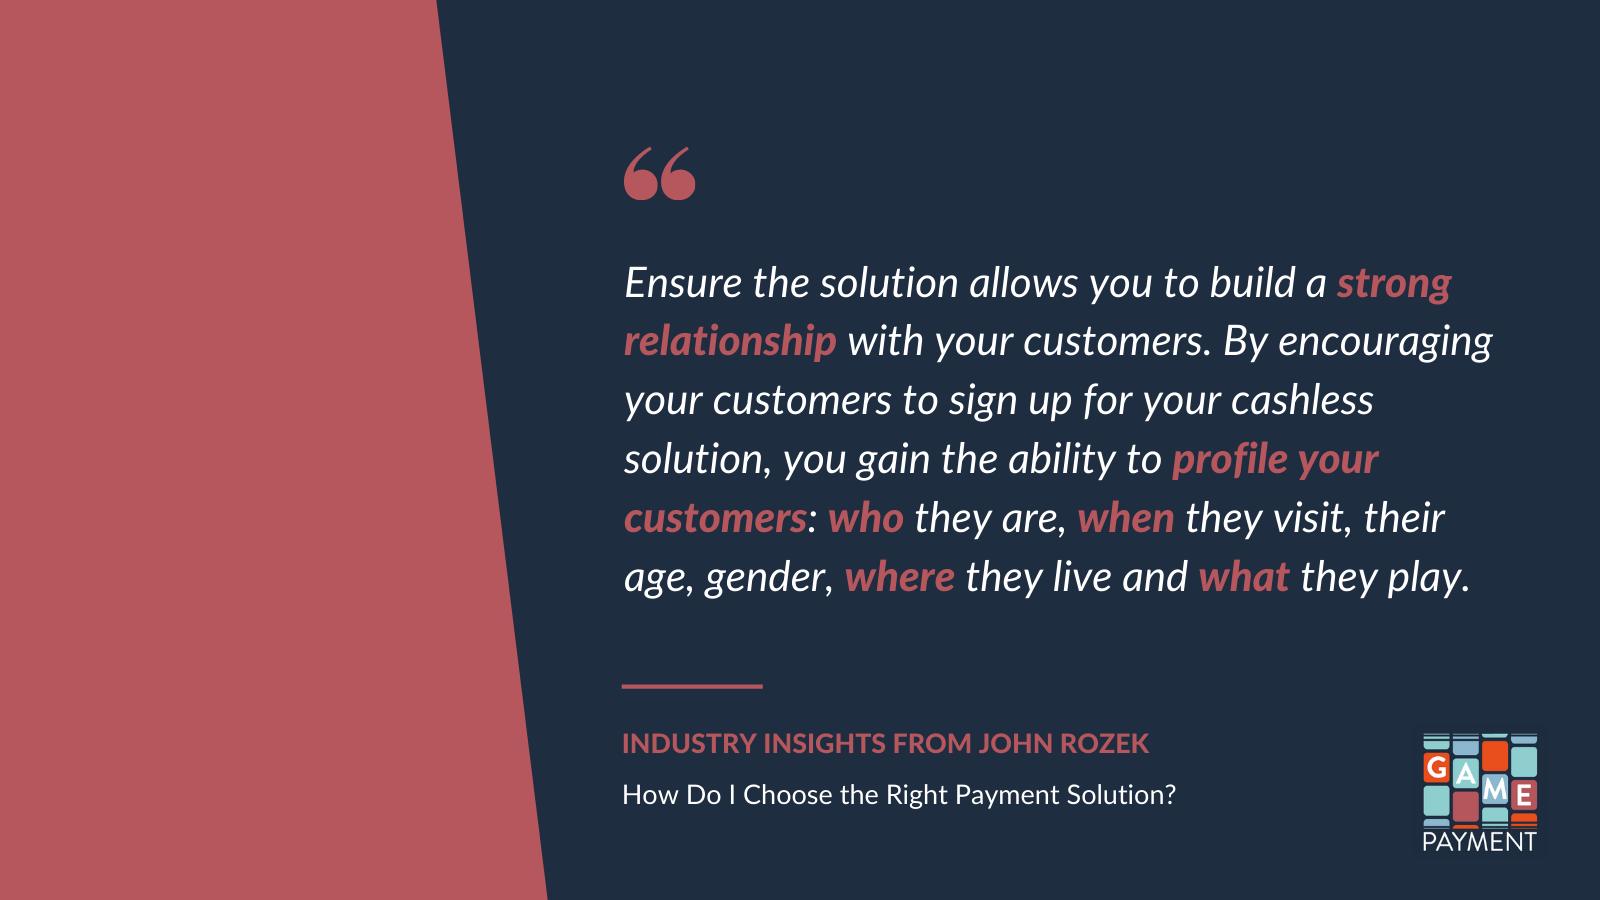 Industry Insights From John Rozek